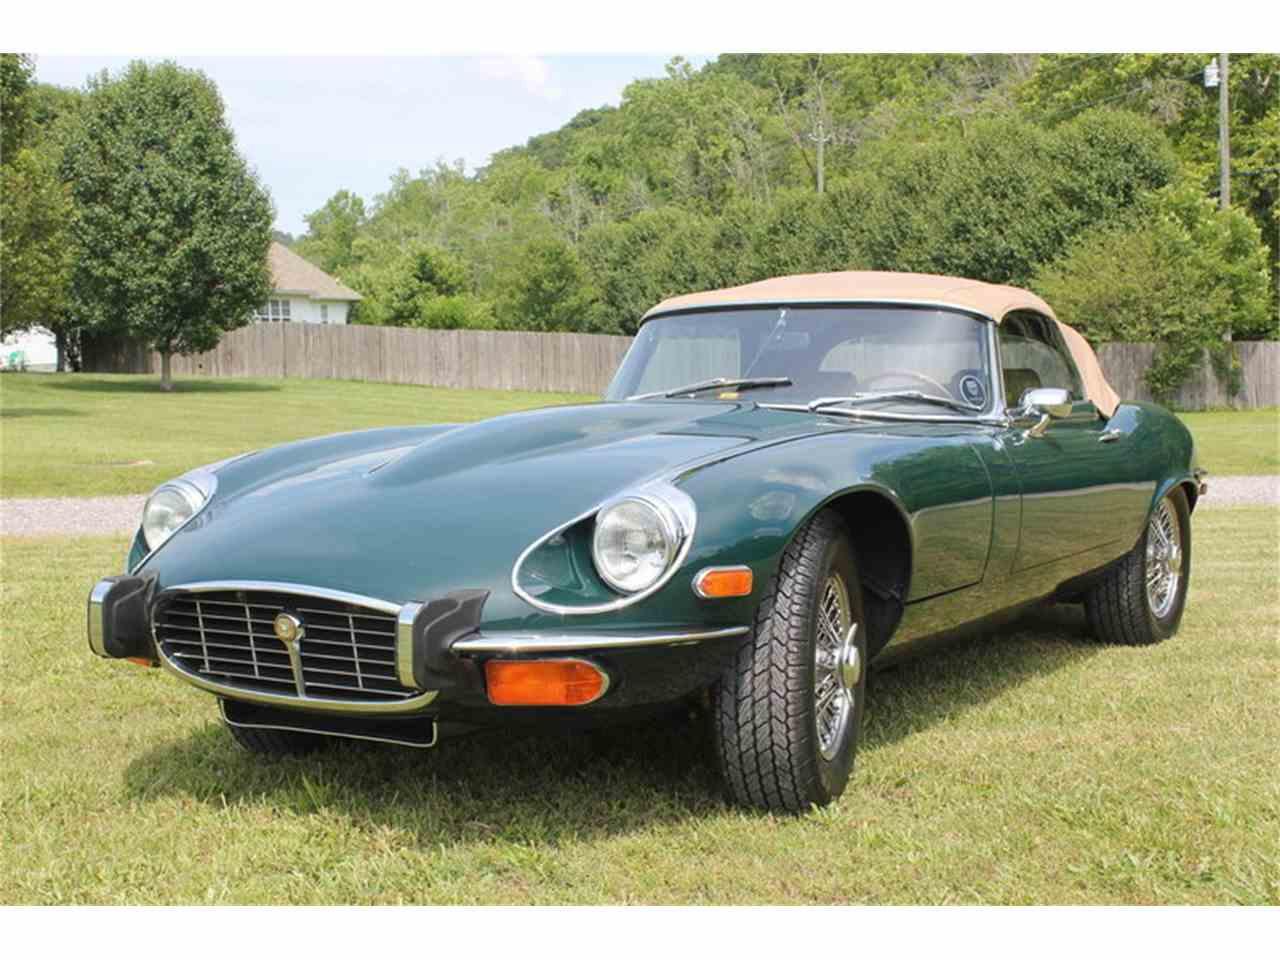 Classic Jaguar for Sale on ClassicCars.com - Pg 4